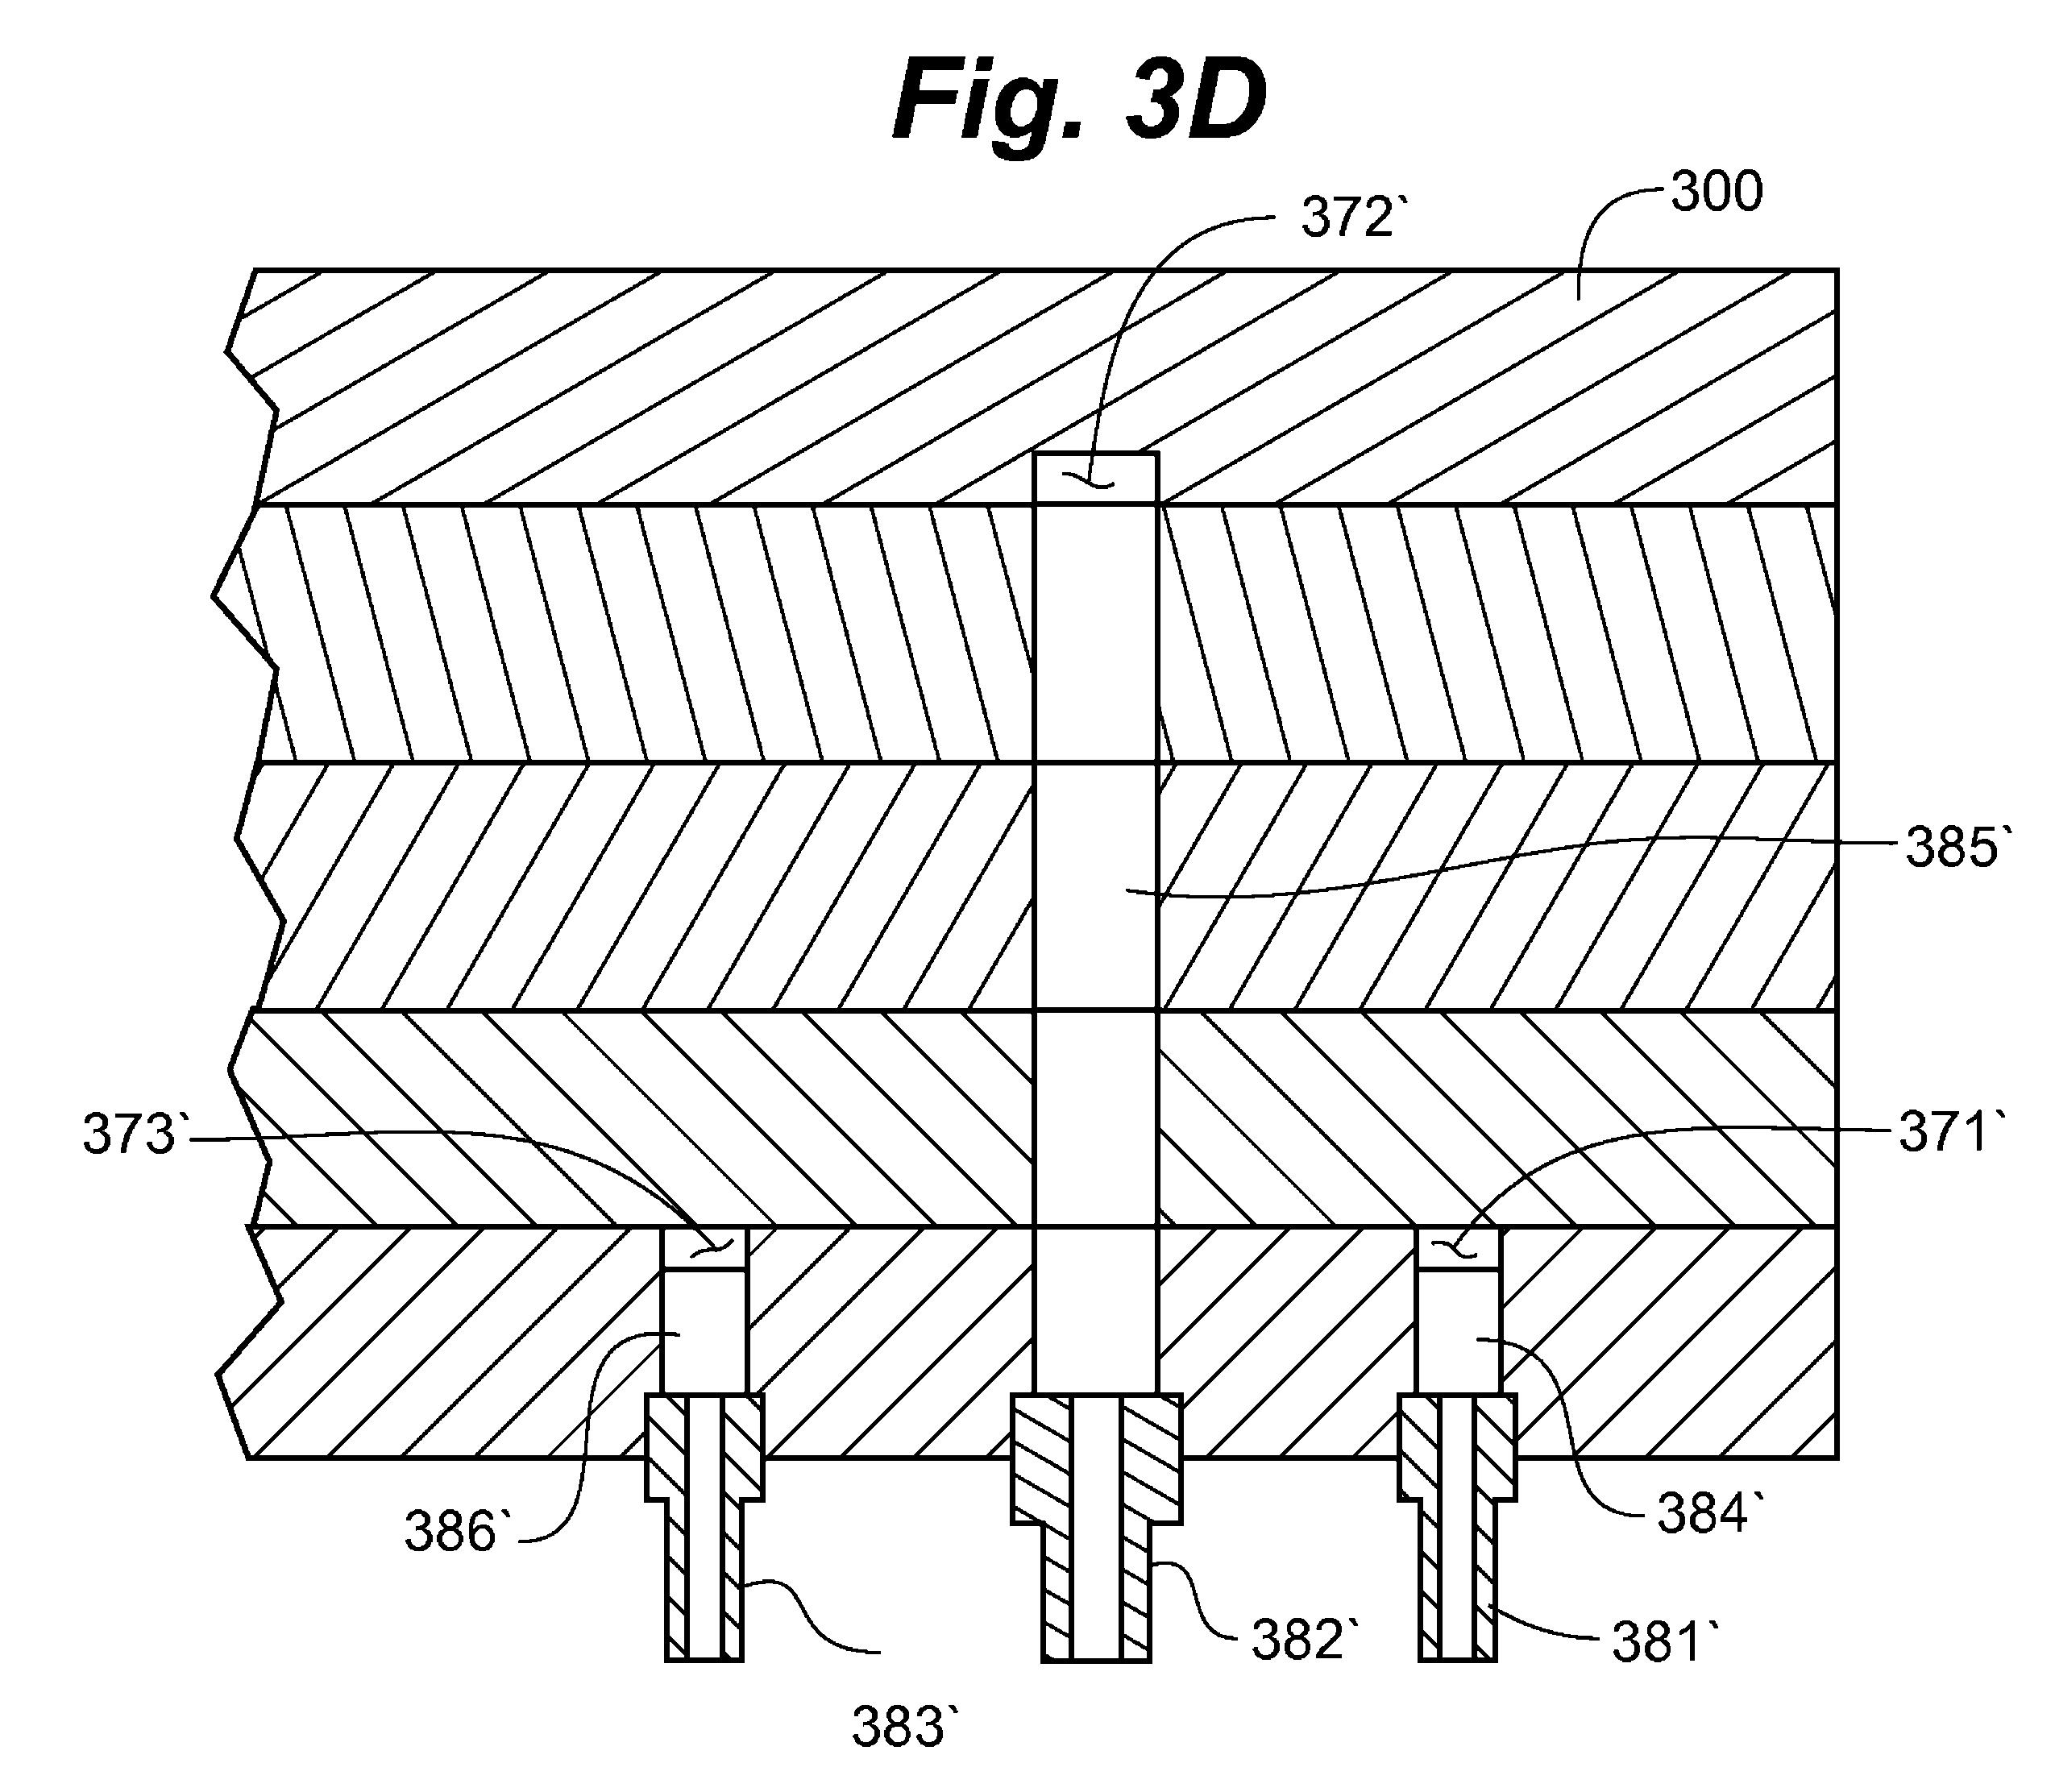 Patent US 8,236,573 B2